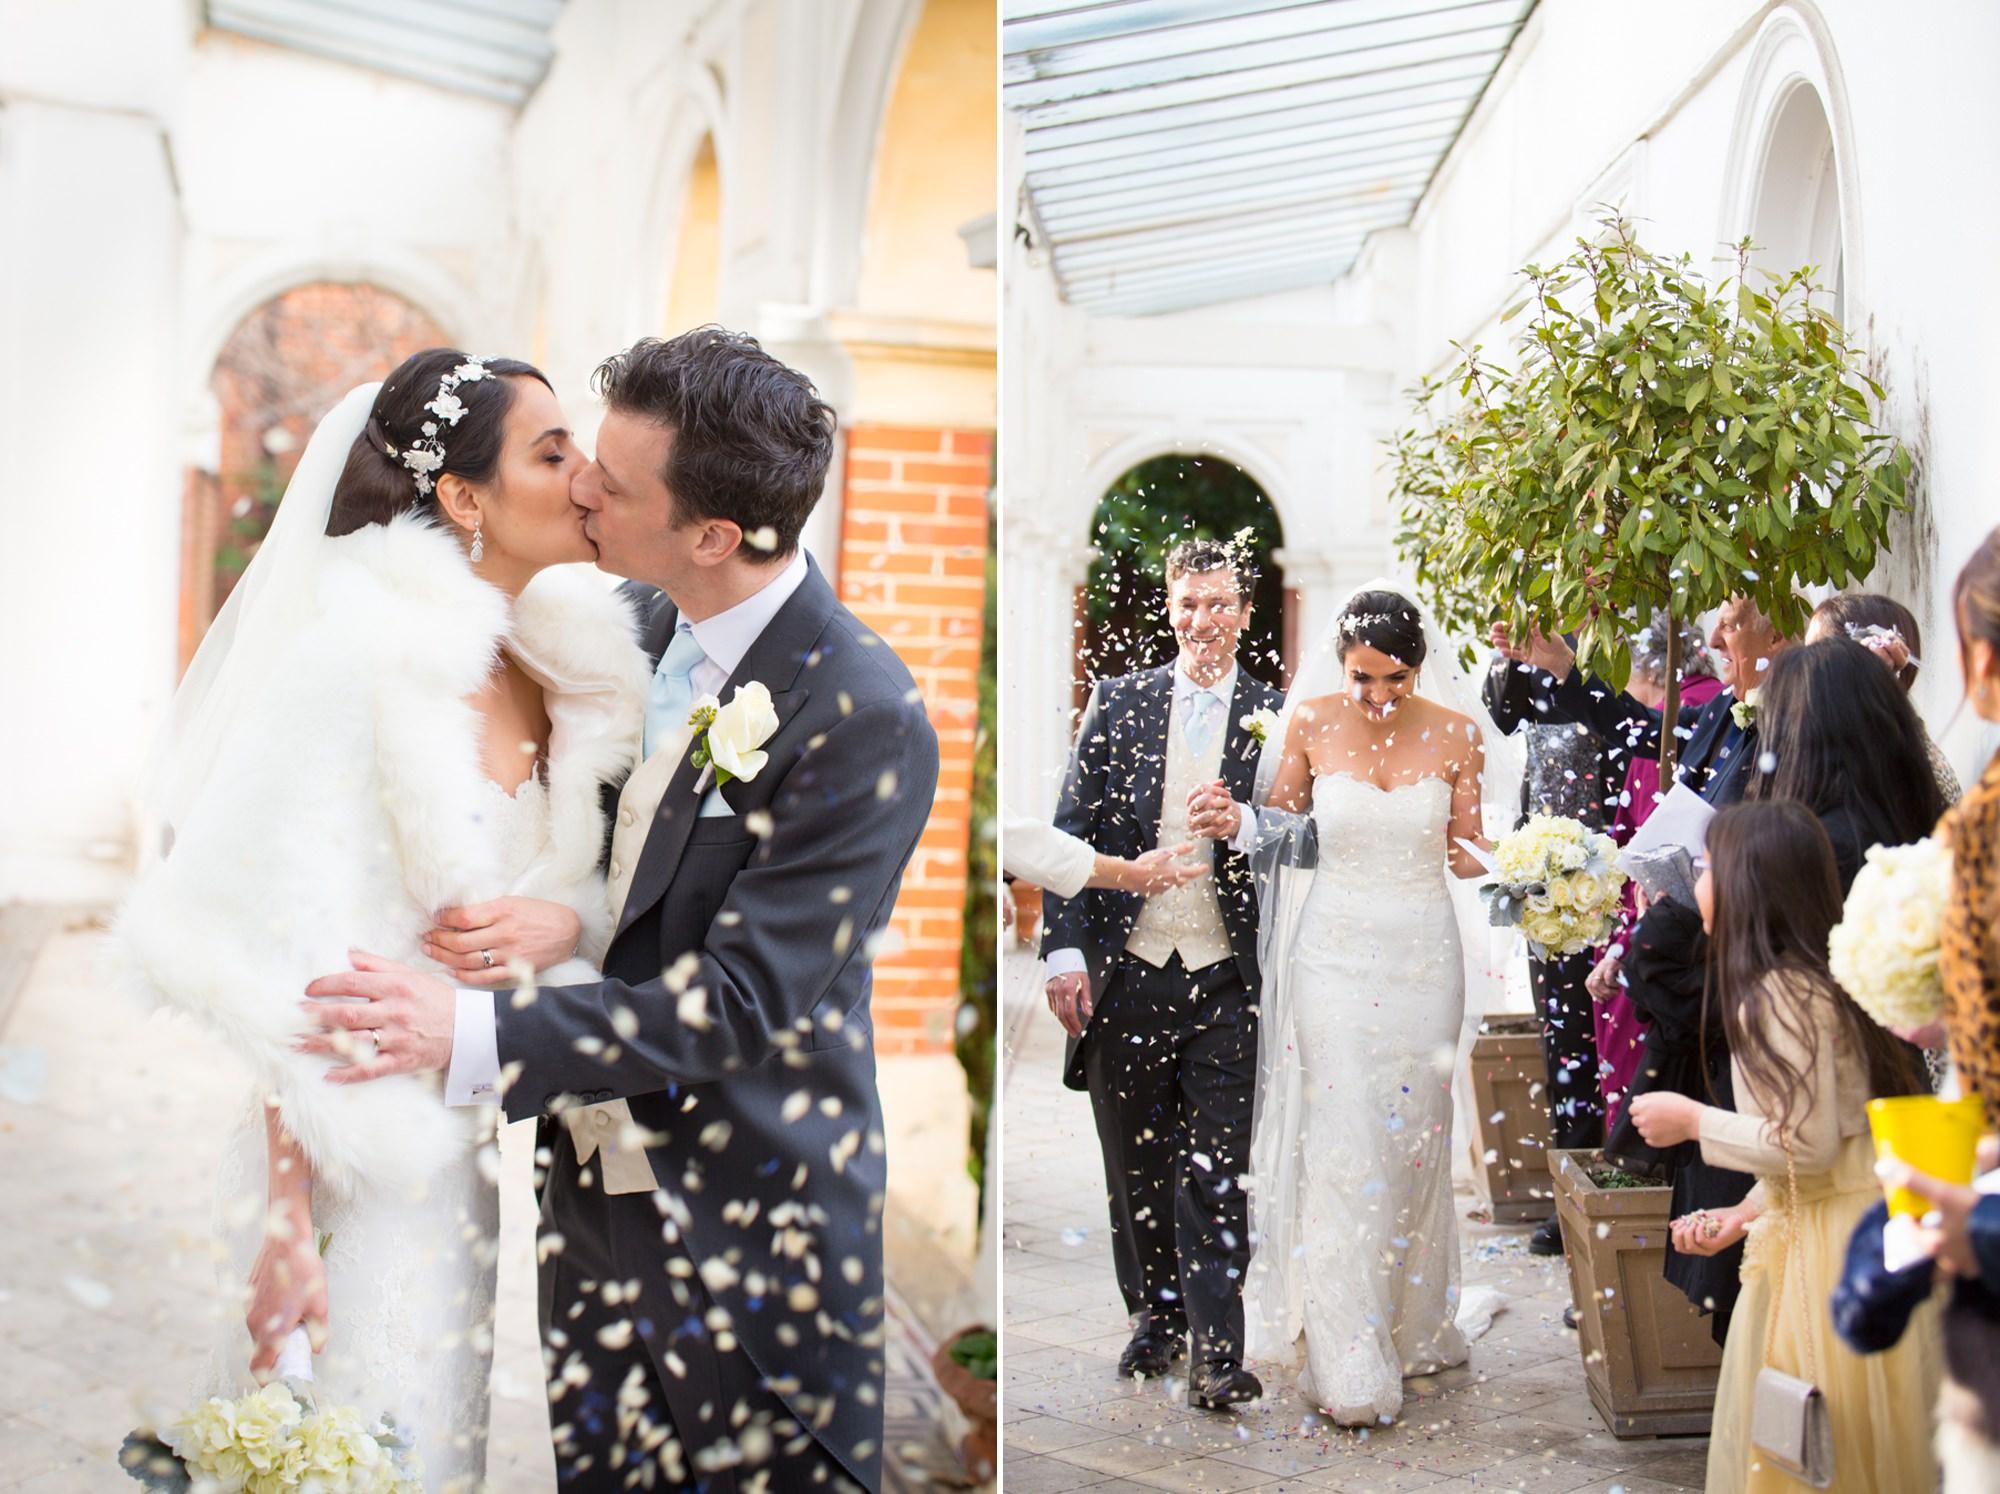 bromley-registry-office-wedding-6